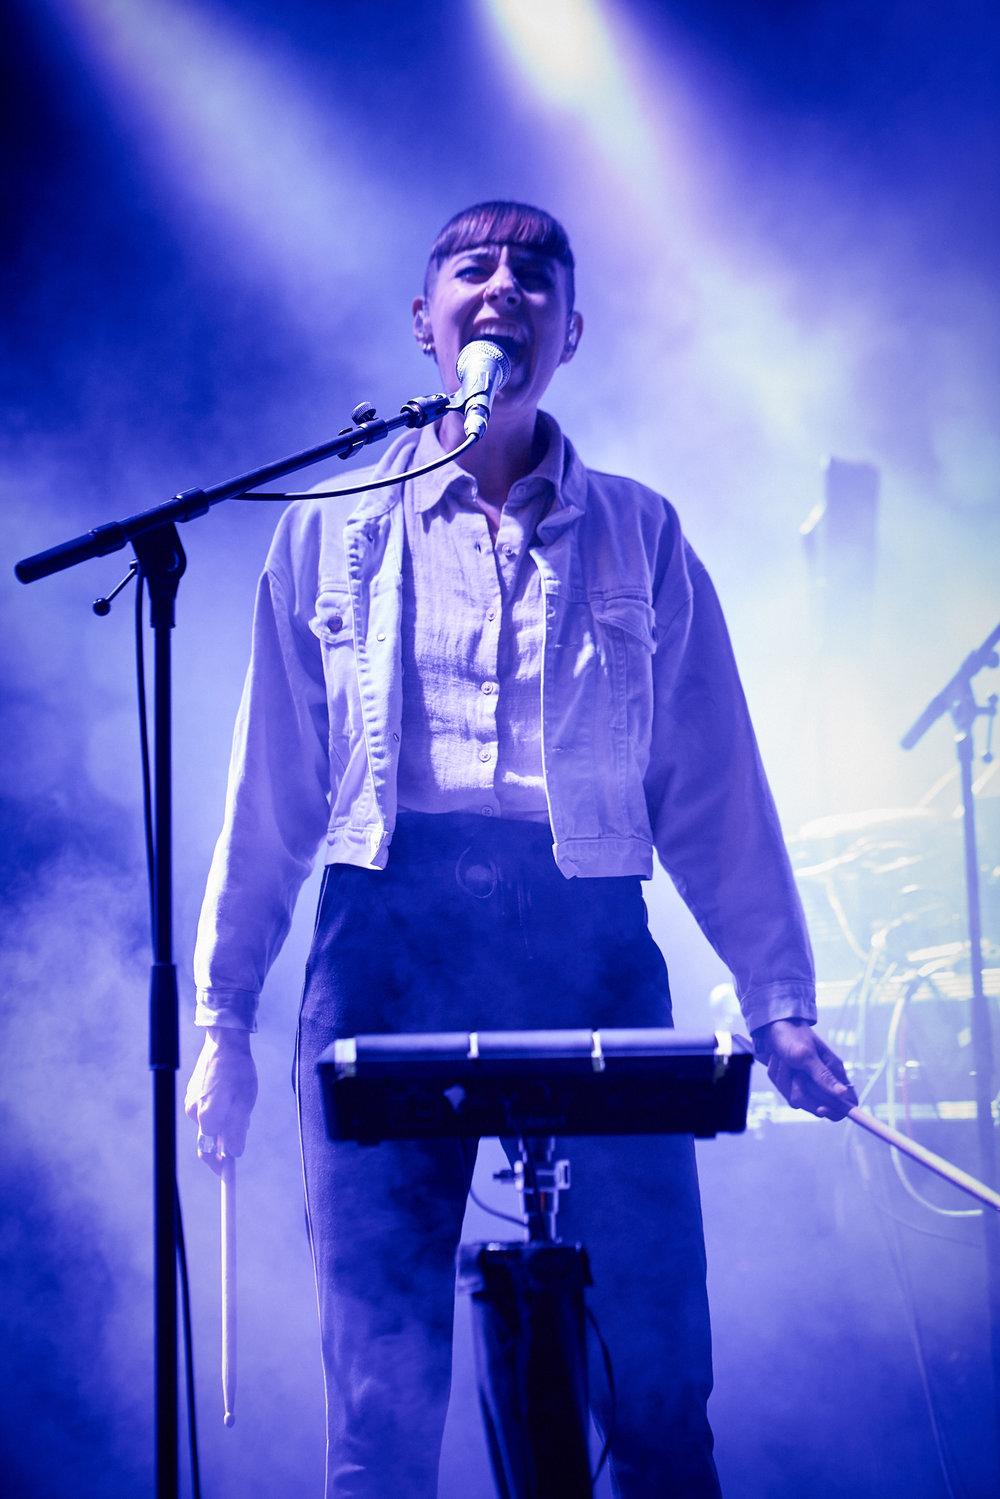 Peter L. Nielsen, www.venstrehaandsarbejde.com